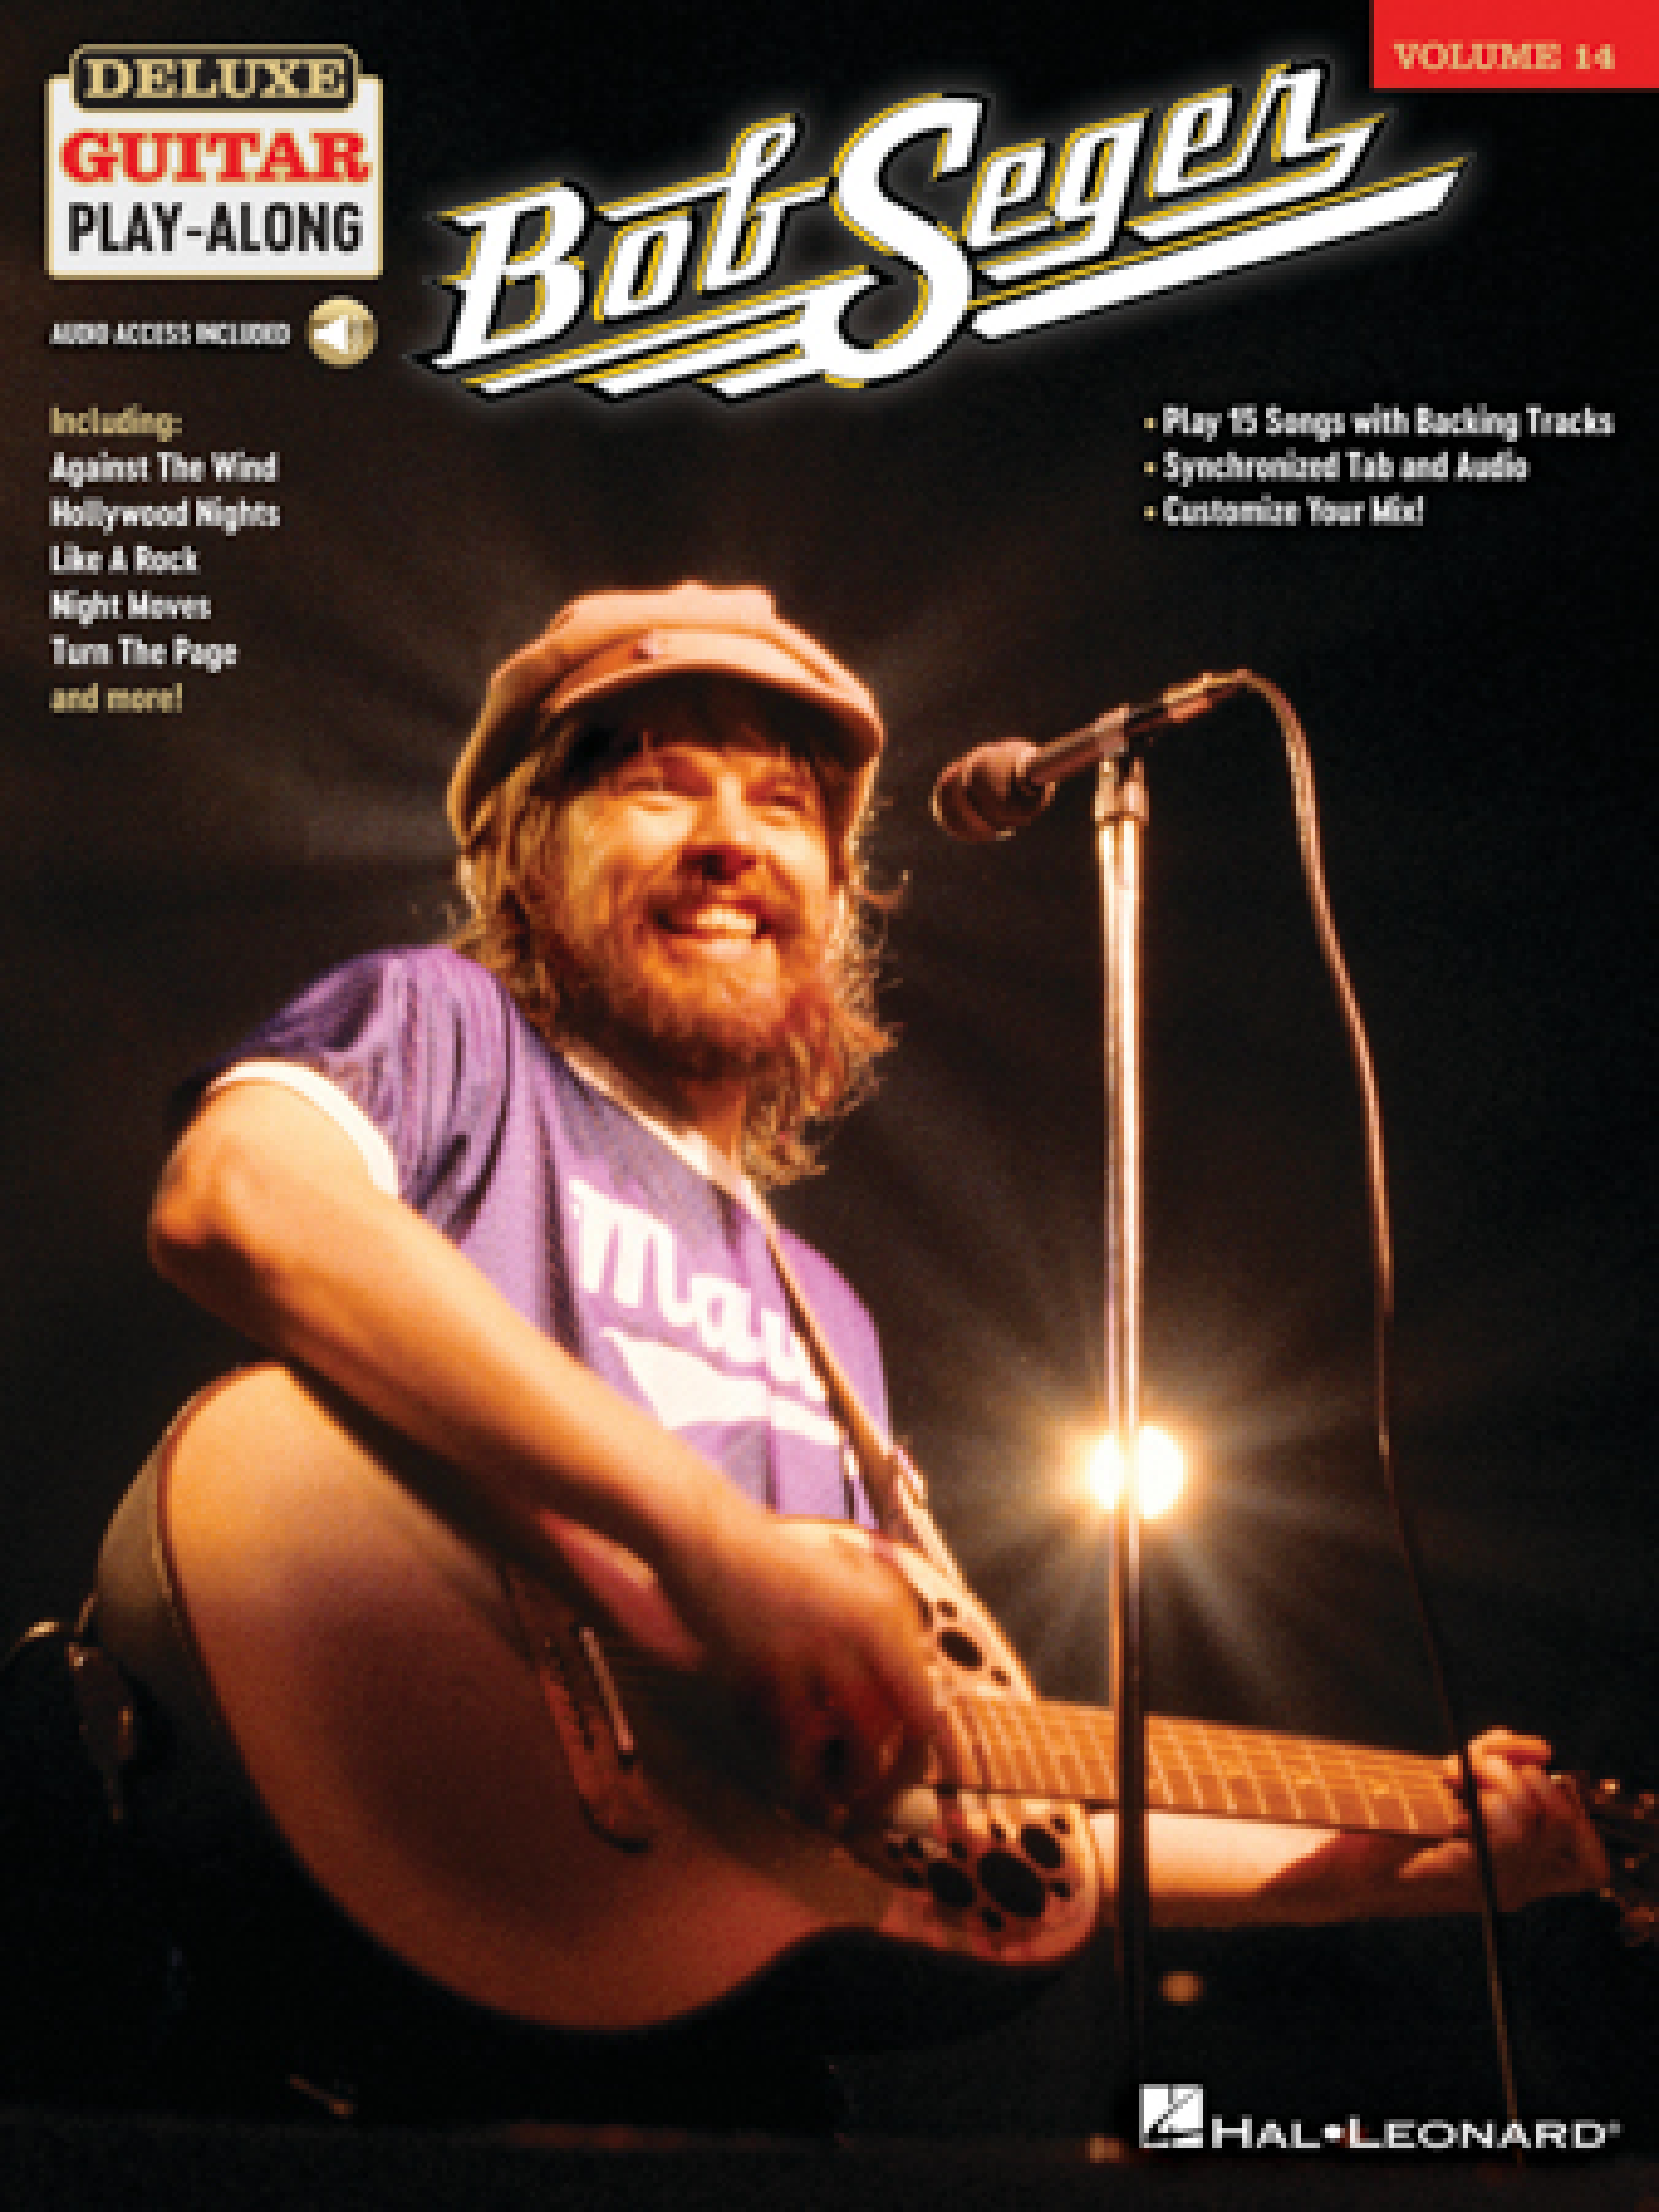 Bob Seger Deluxe Guitar Play-Along Vol. 14